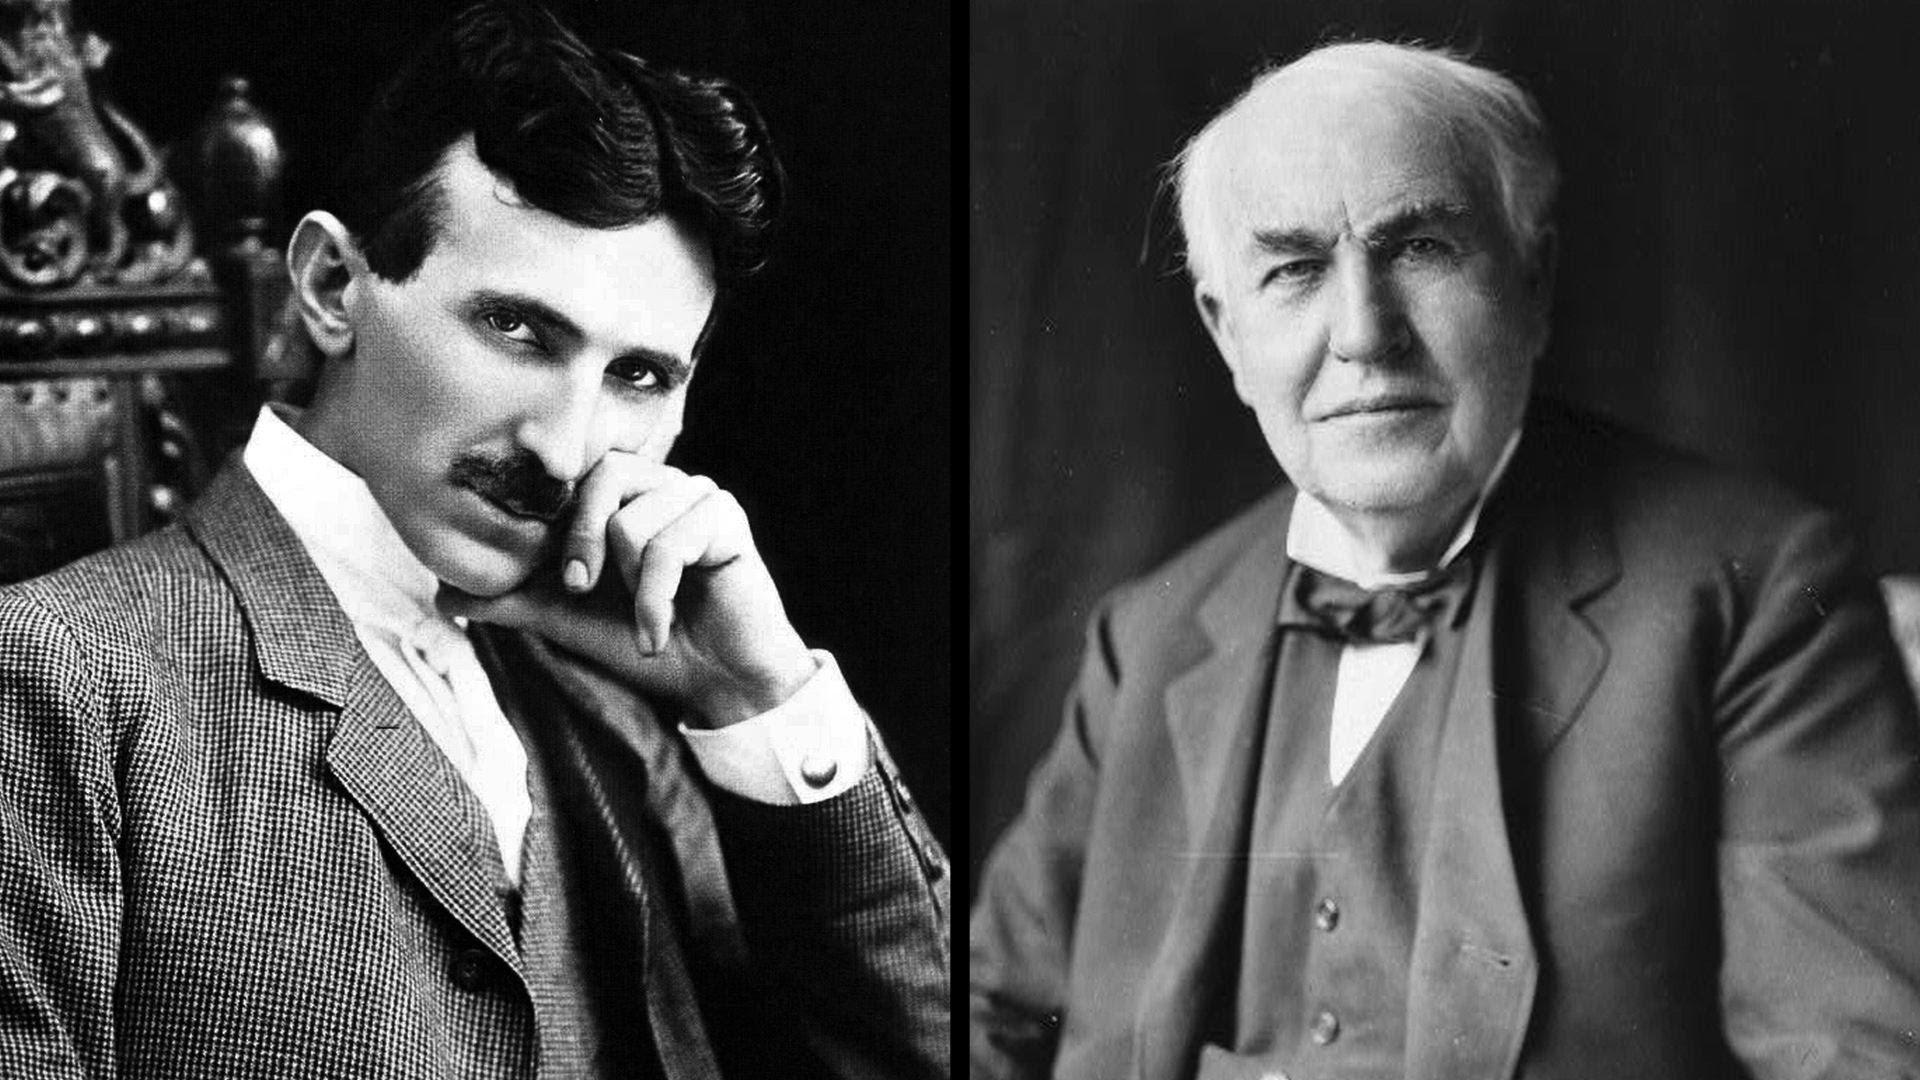 Edison and Tesla